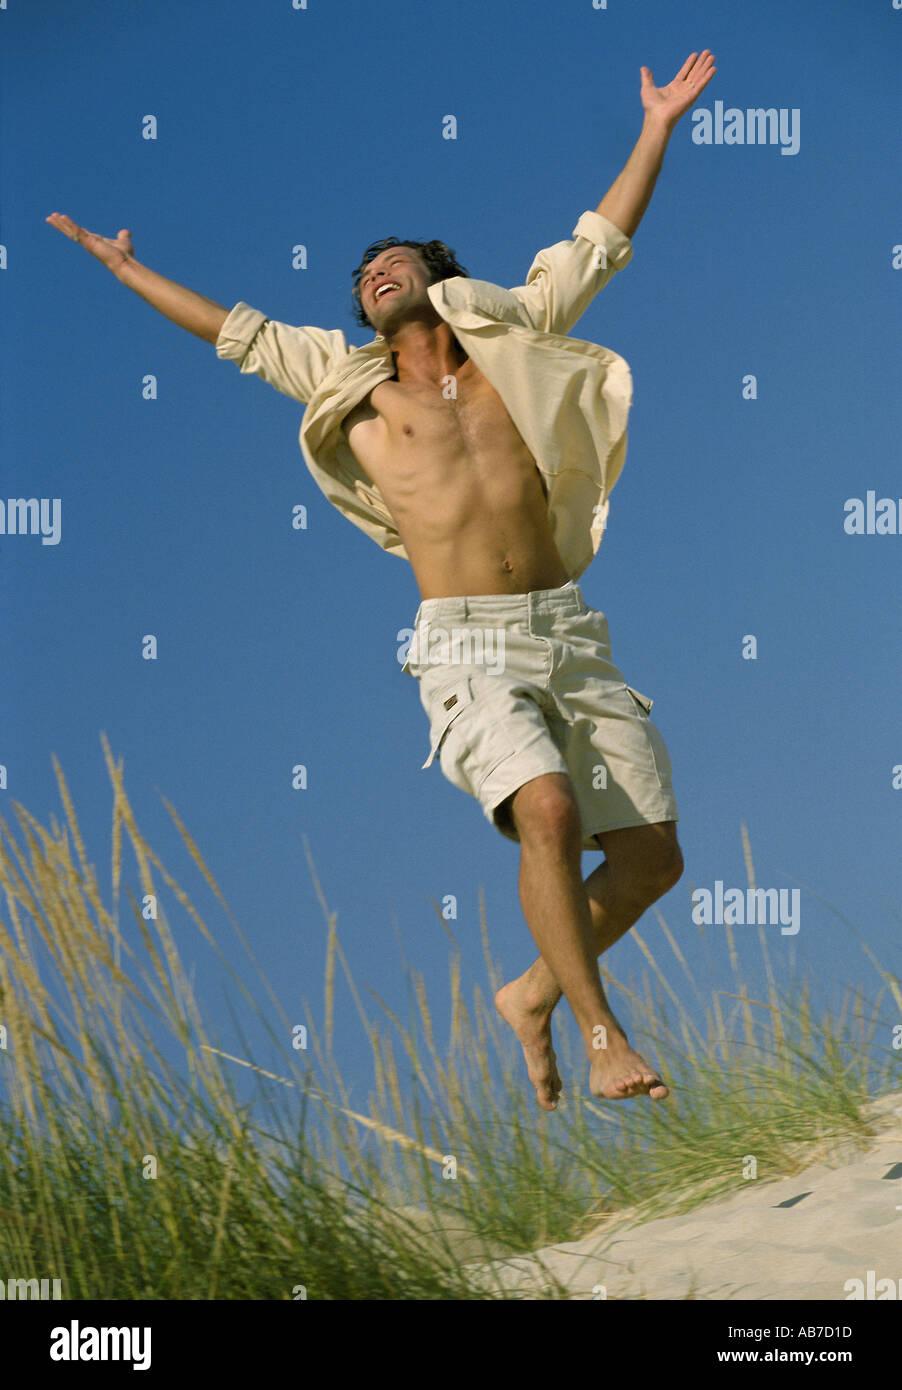 Man rejoicing - Stock Image